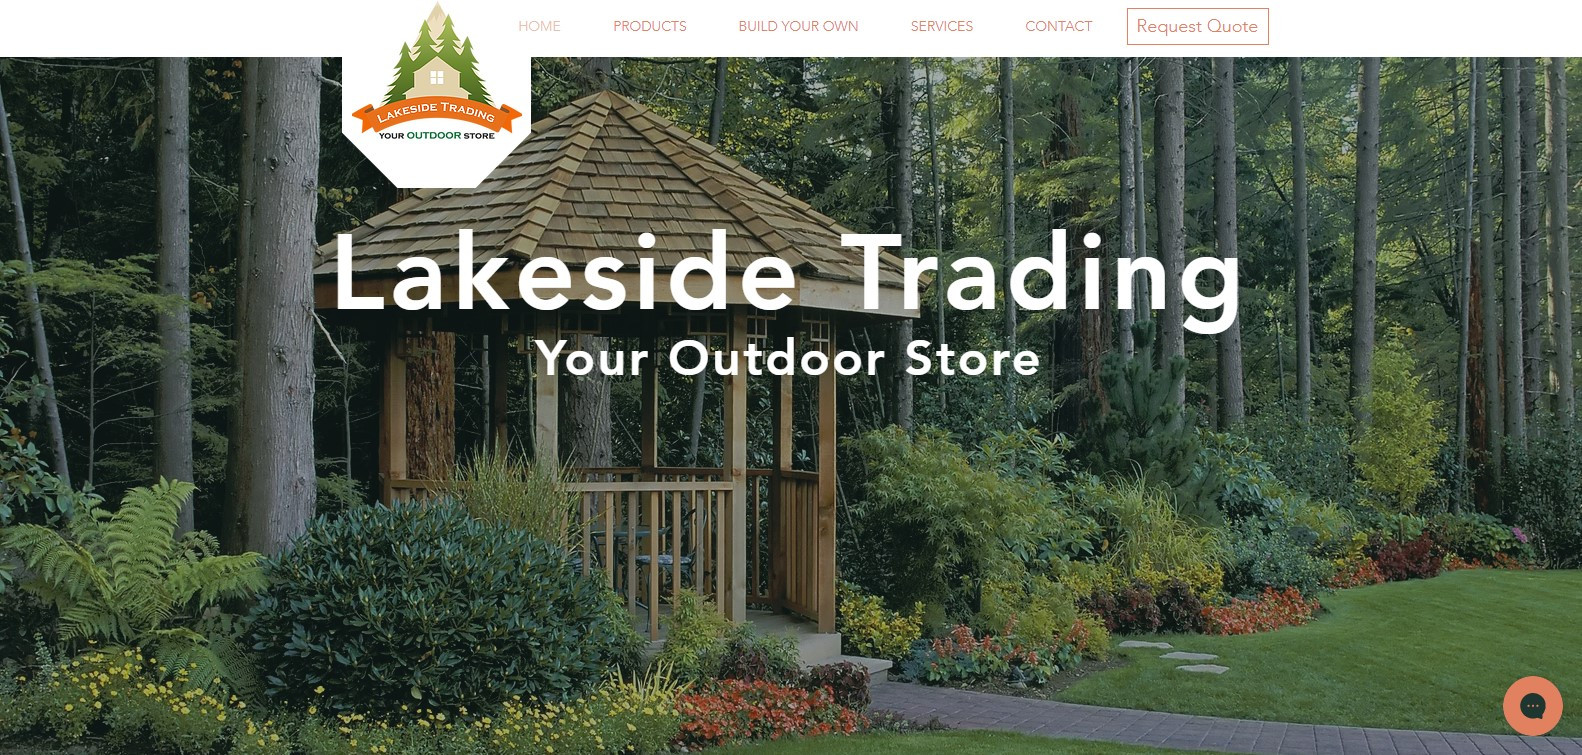 Lakeside Trading